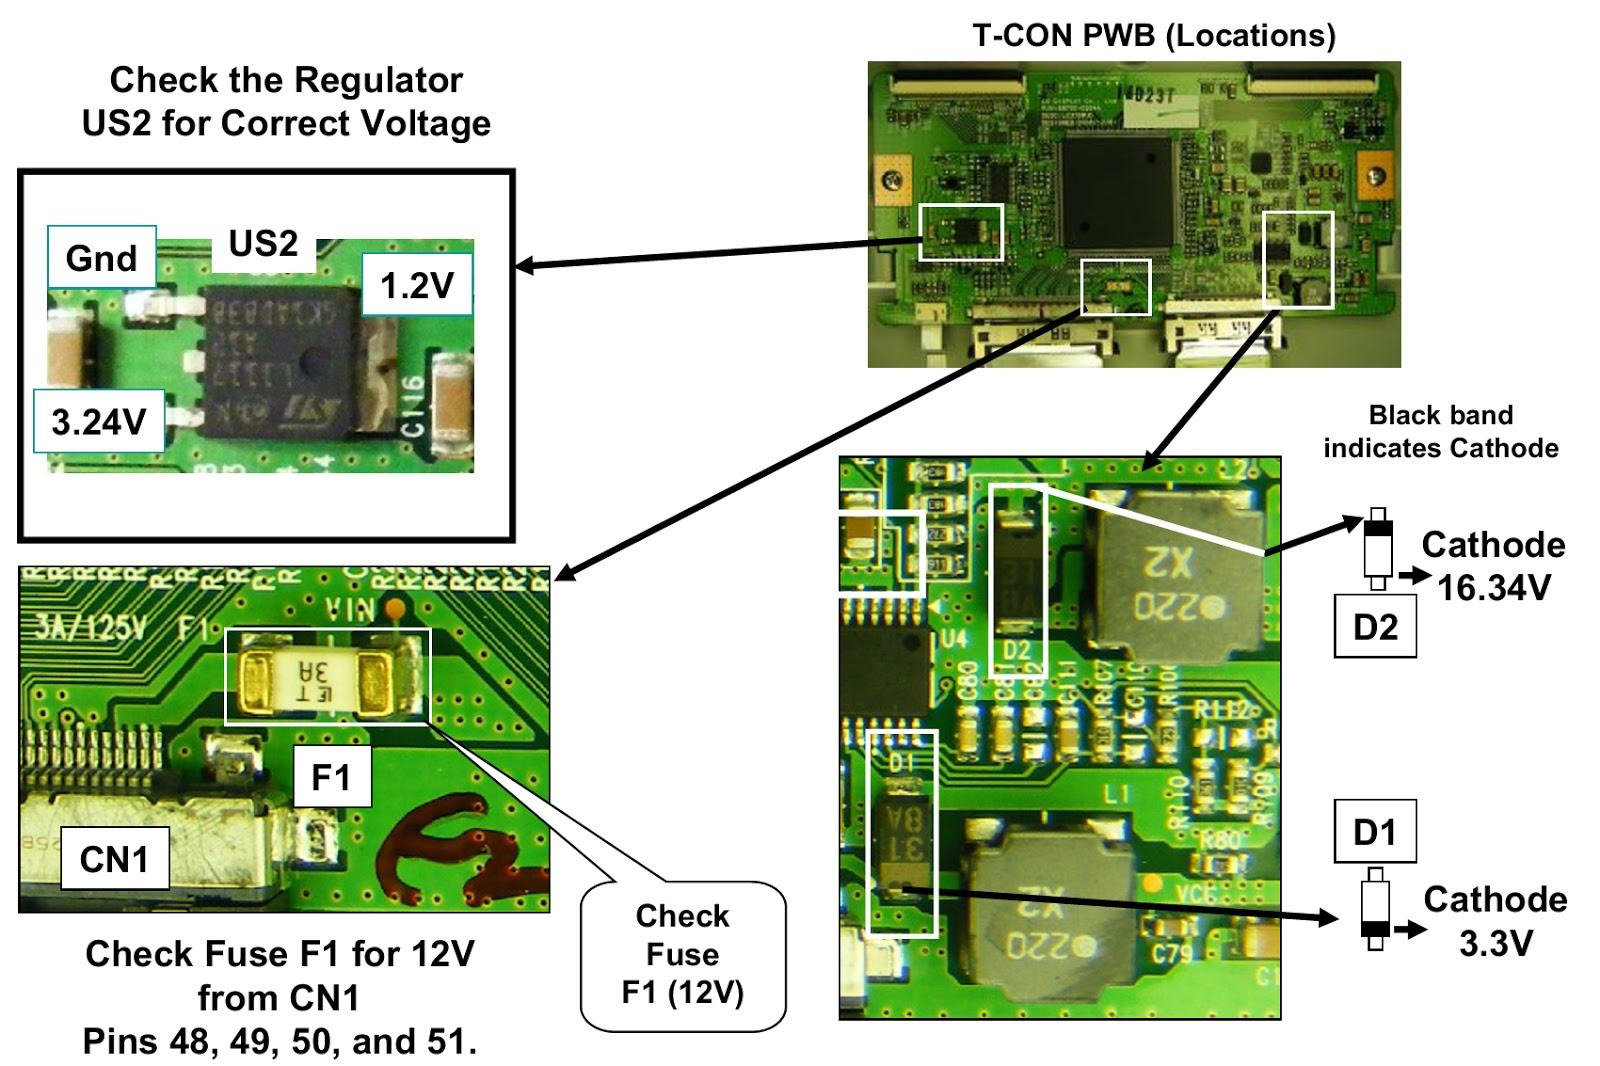 carrier circuit board wiring diagram lg 37lh55 - t-con board - removal [lcd controller board ... t con board circuit diagram